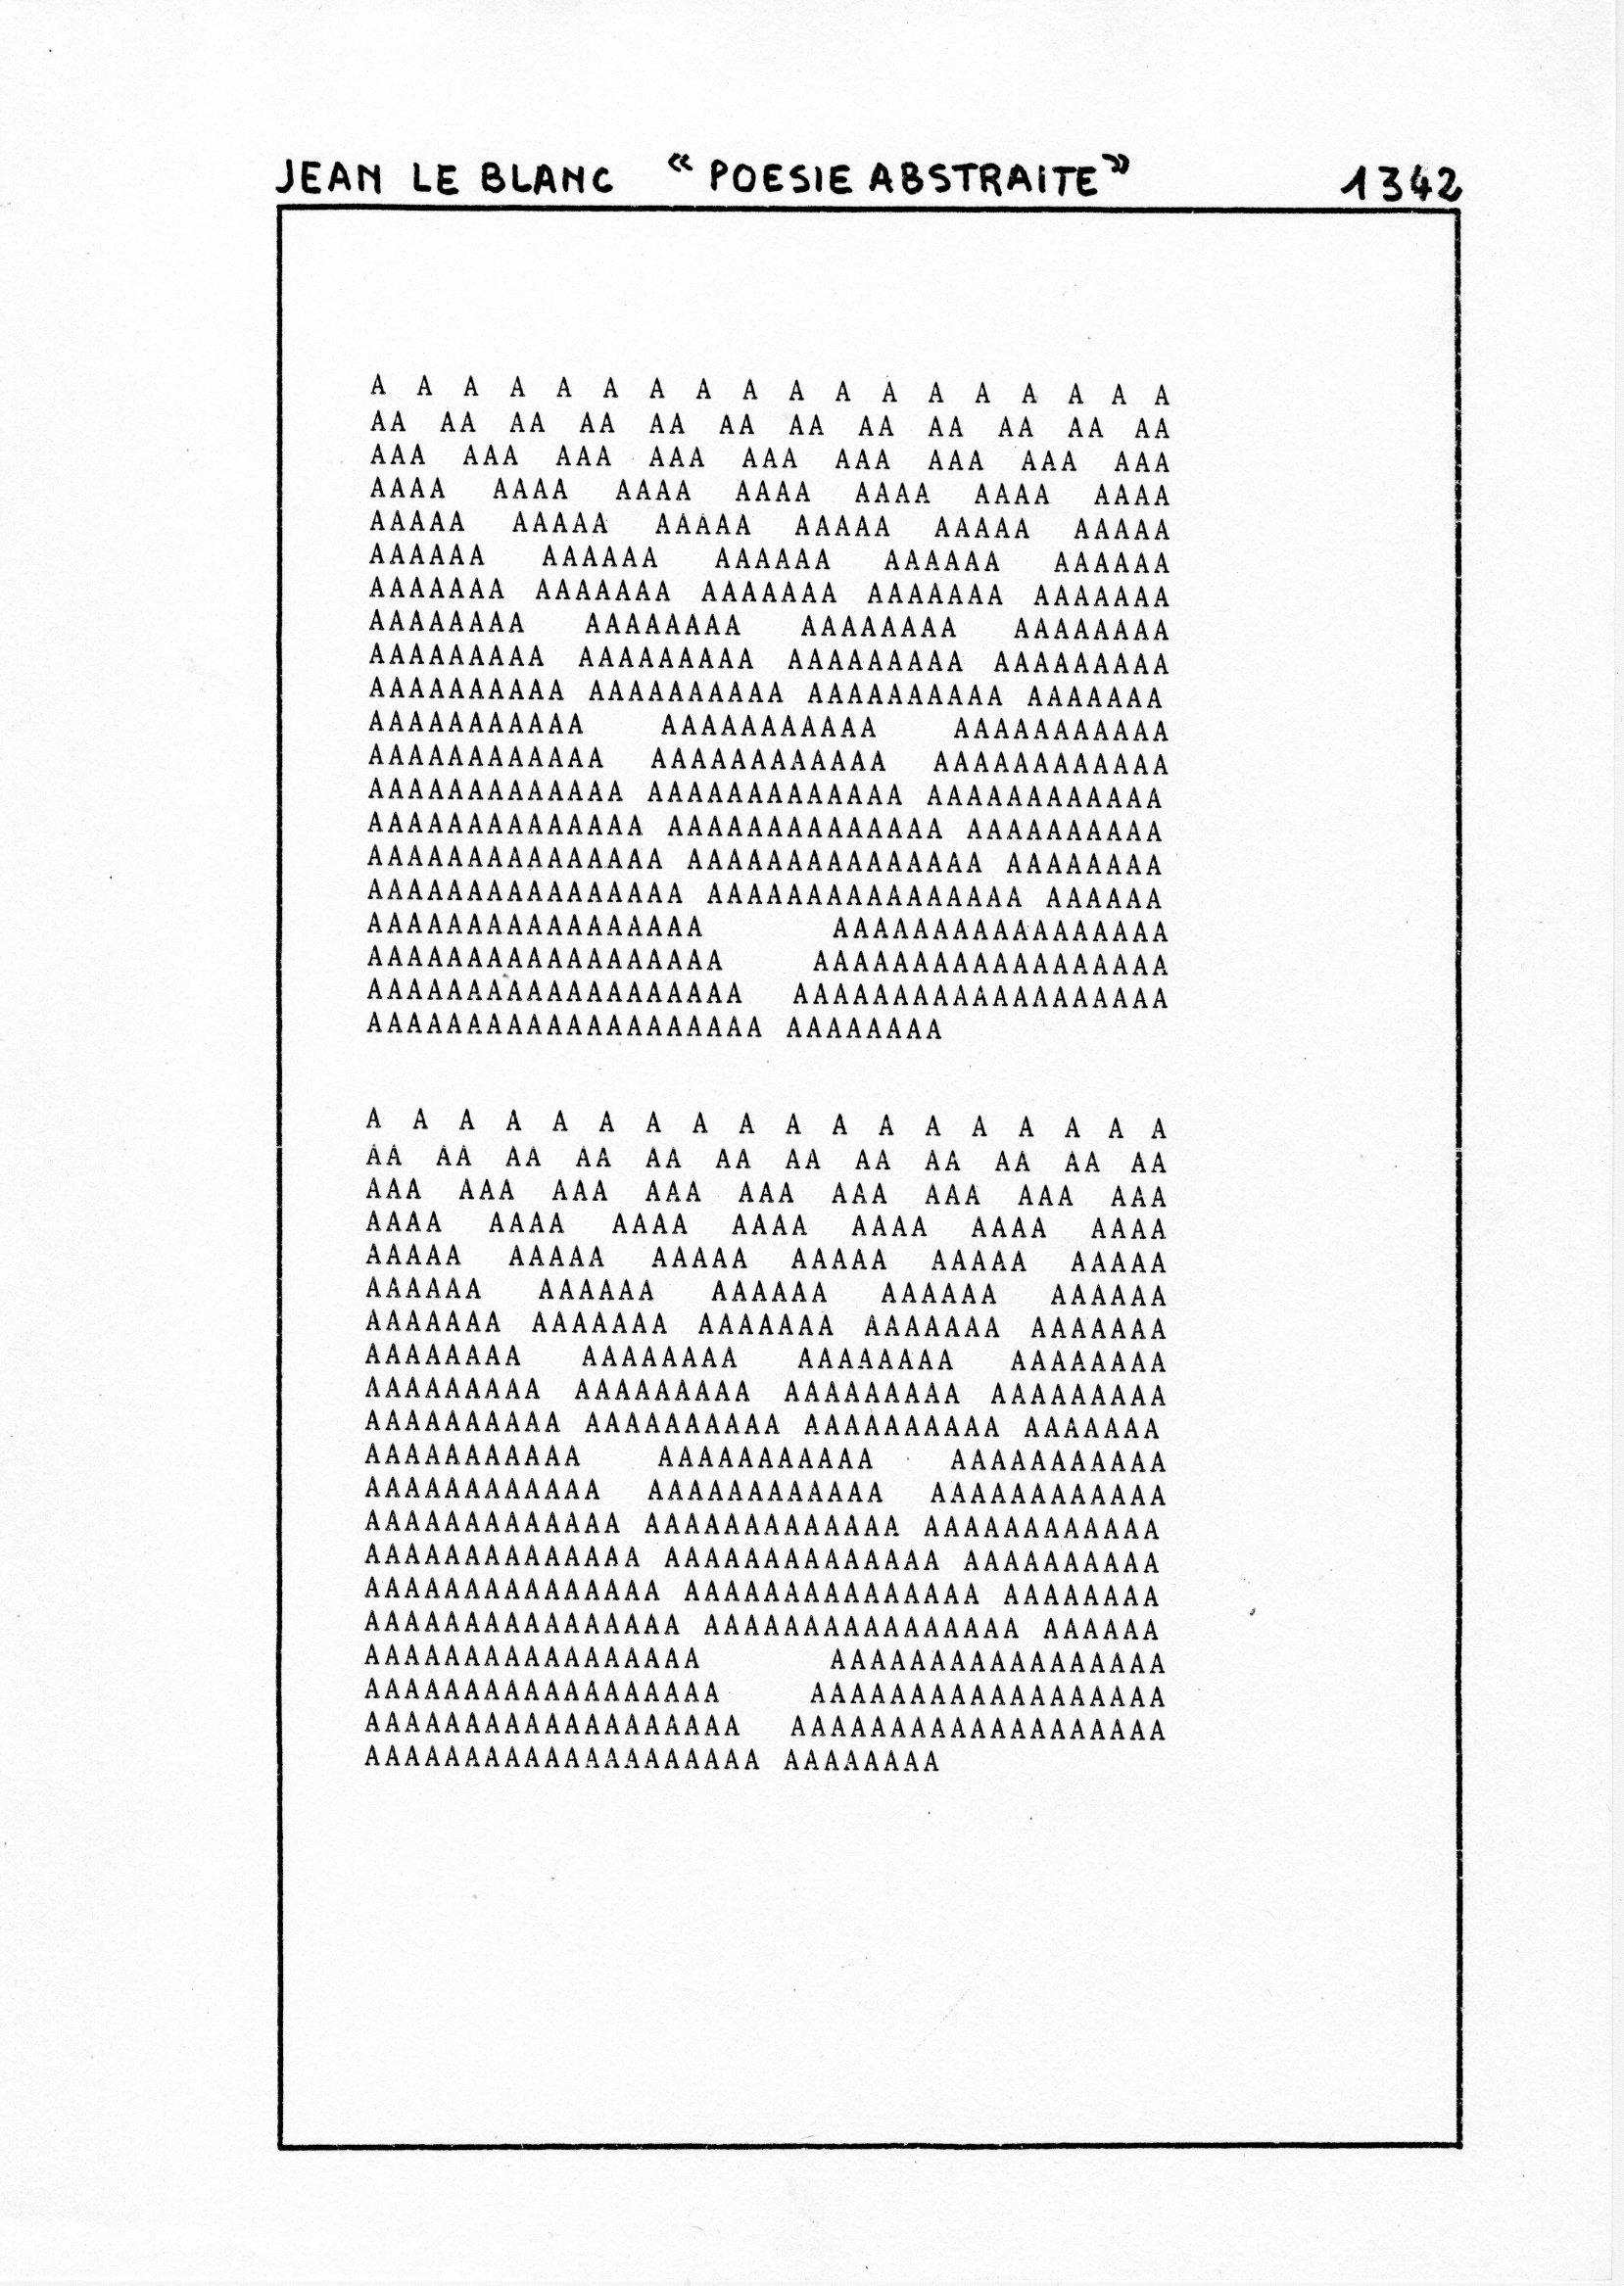 page 1342 Jean Le Blanc POESIE ABSTRAITE